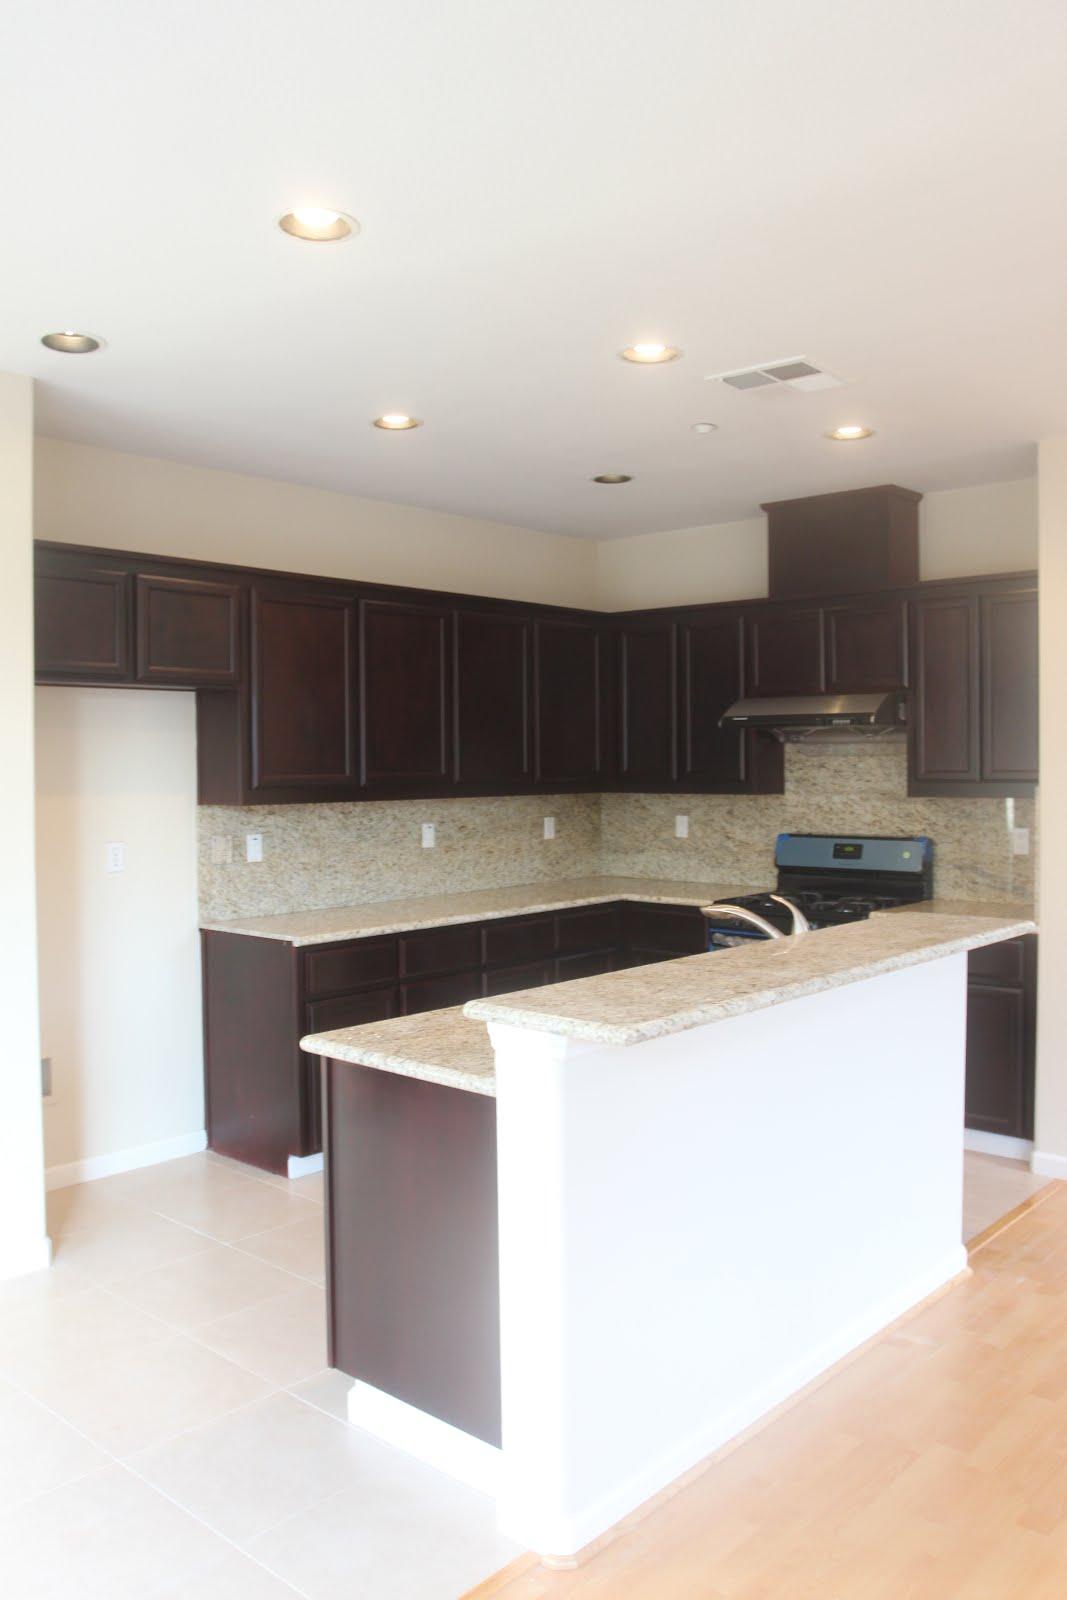 Hong Bo Hardware Supply: Refinish Kitchen Oak Cabinets And